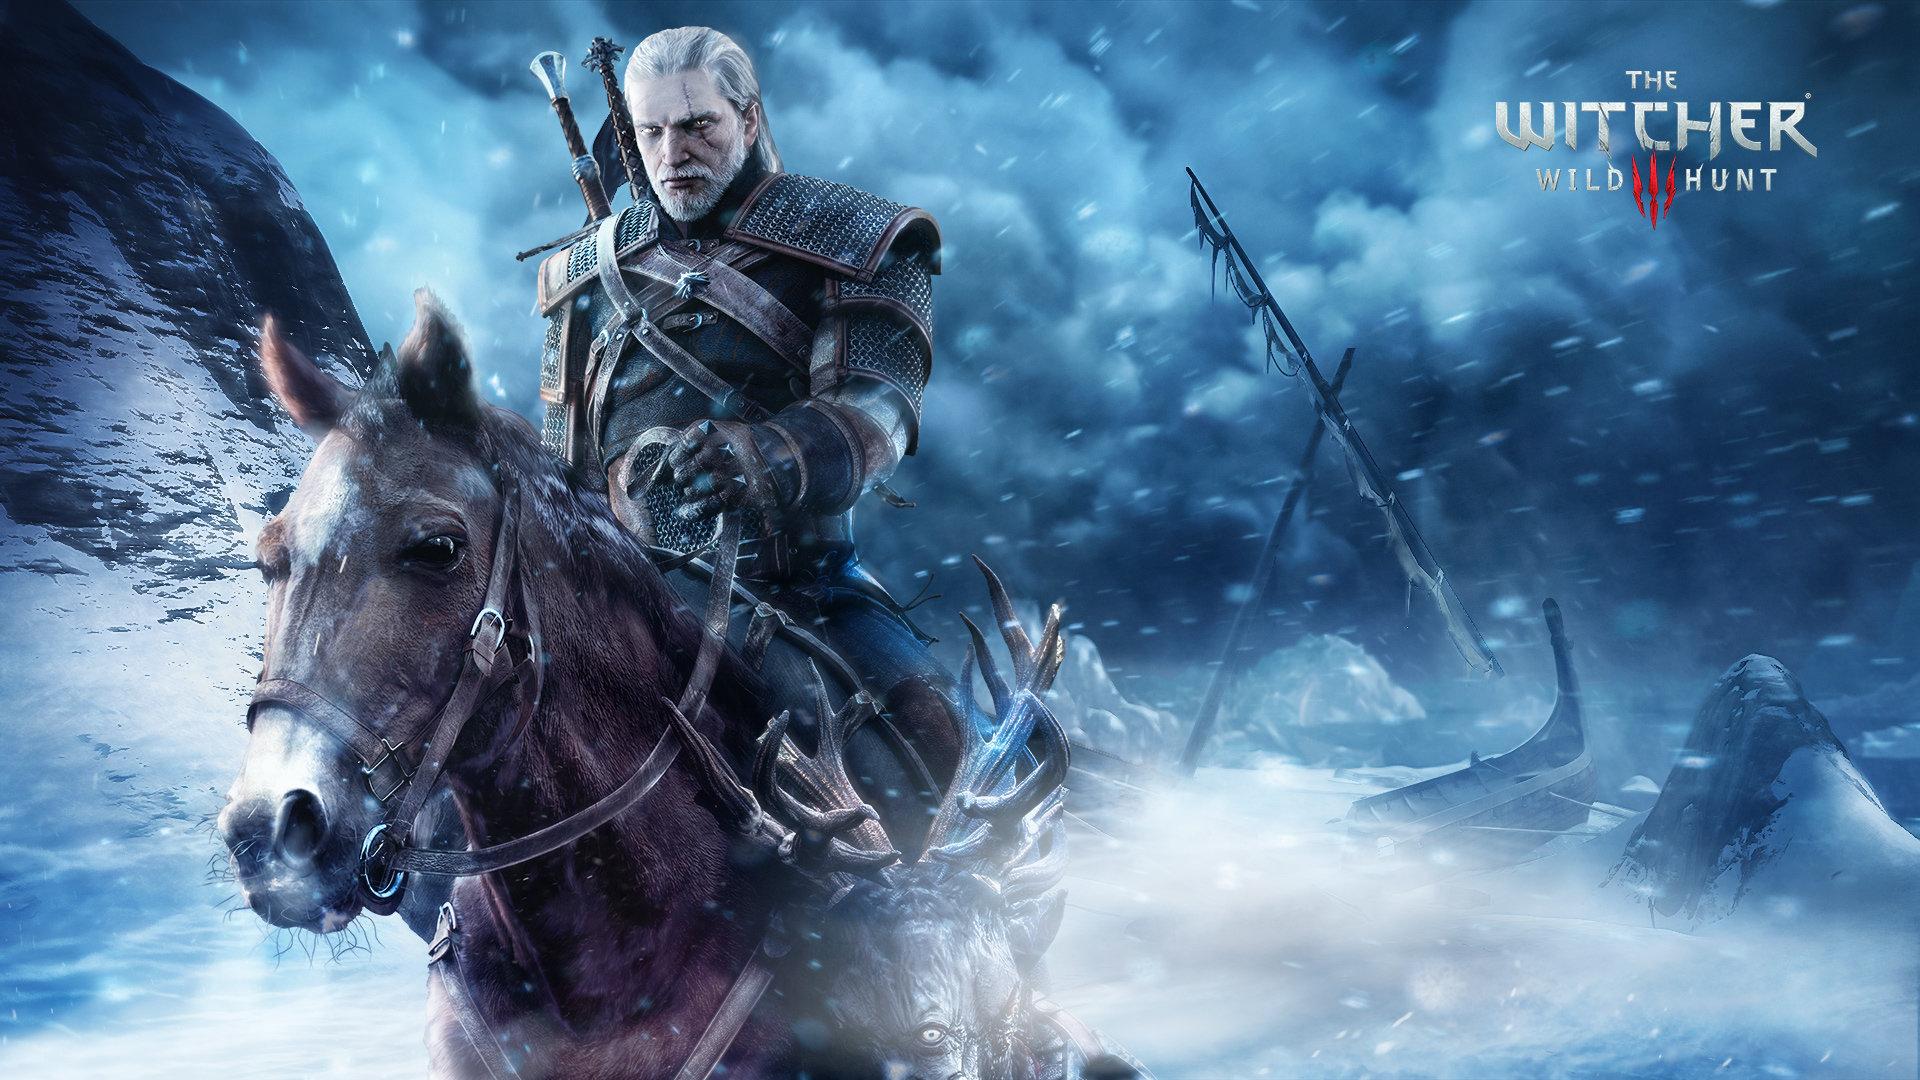 Geralt Of Rivia Wallpapers 1920x1080 Full Hd 1080p Desktop